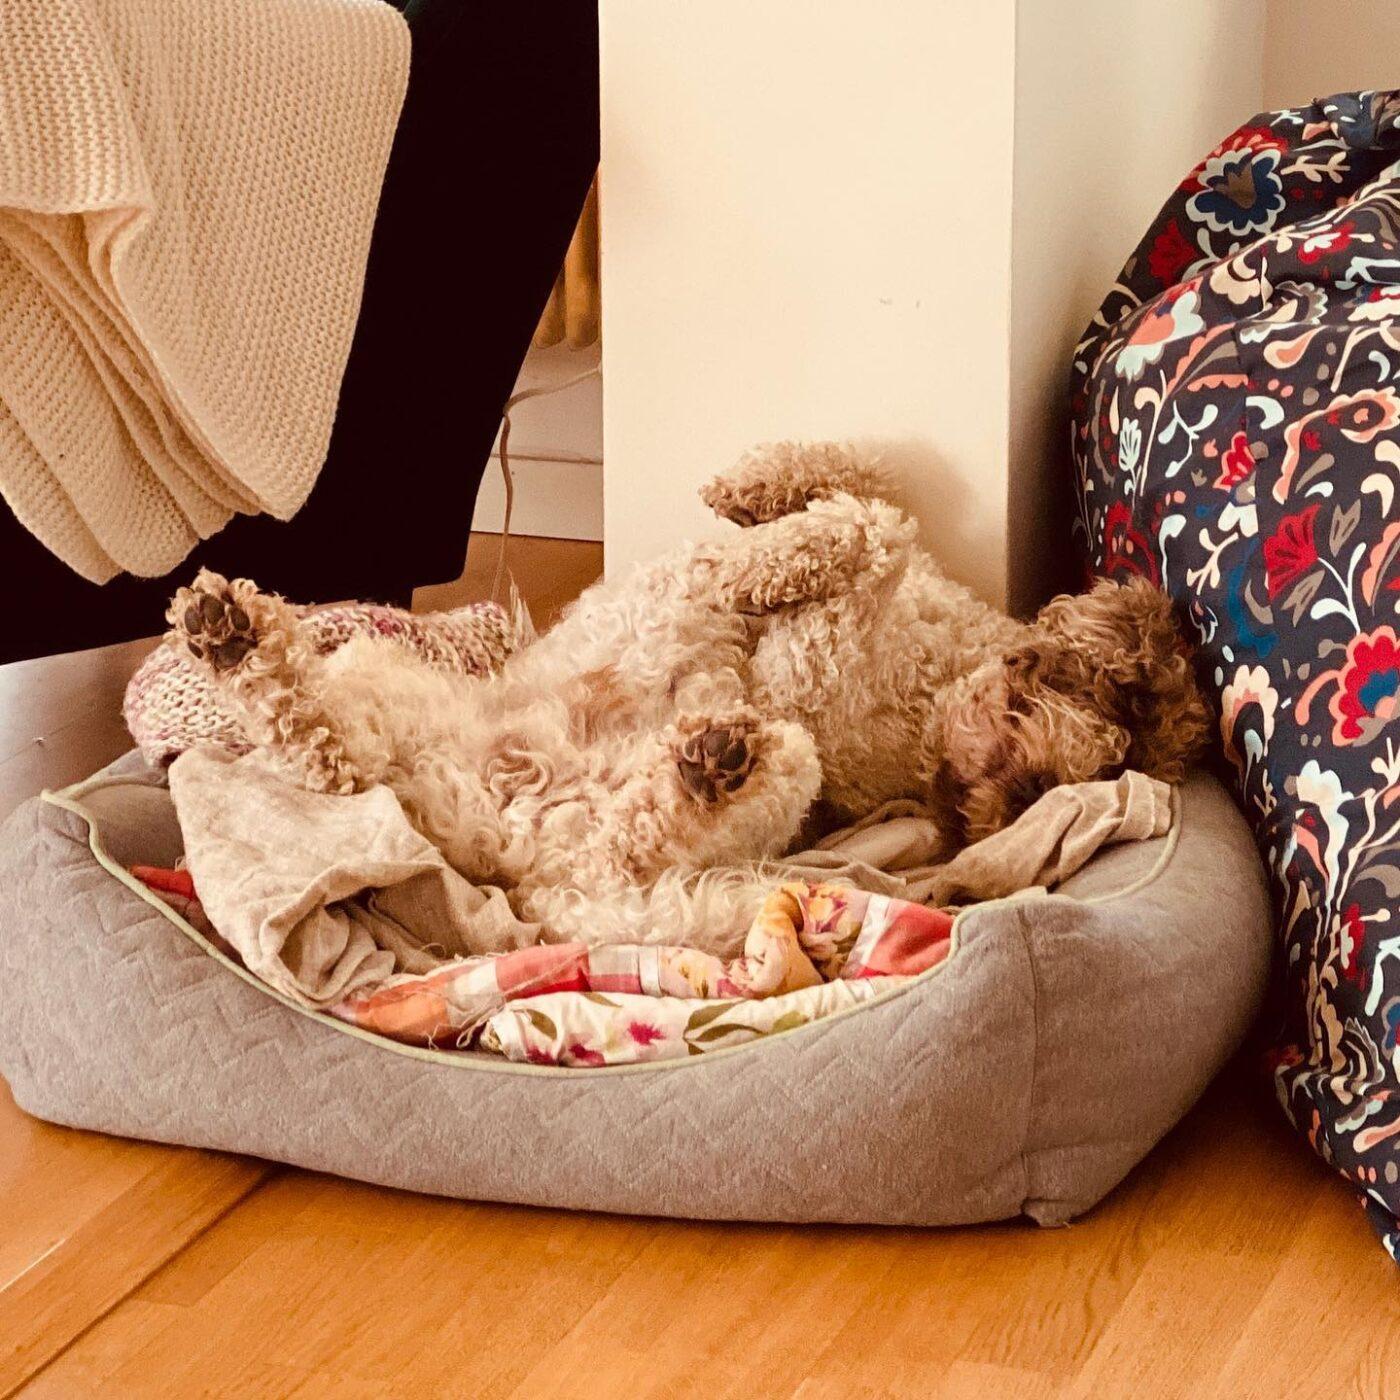 I'm one with the bed! #happydog #lagottoromagnolo